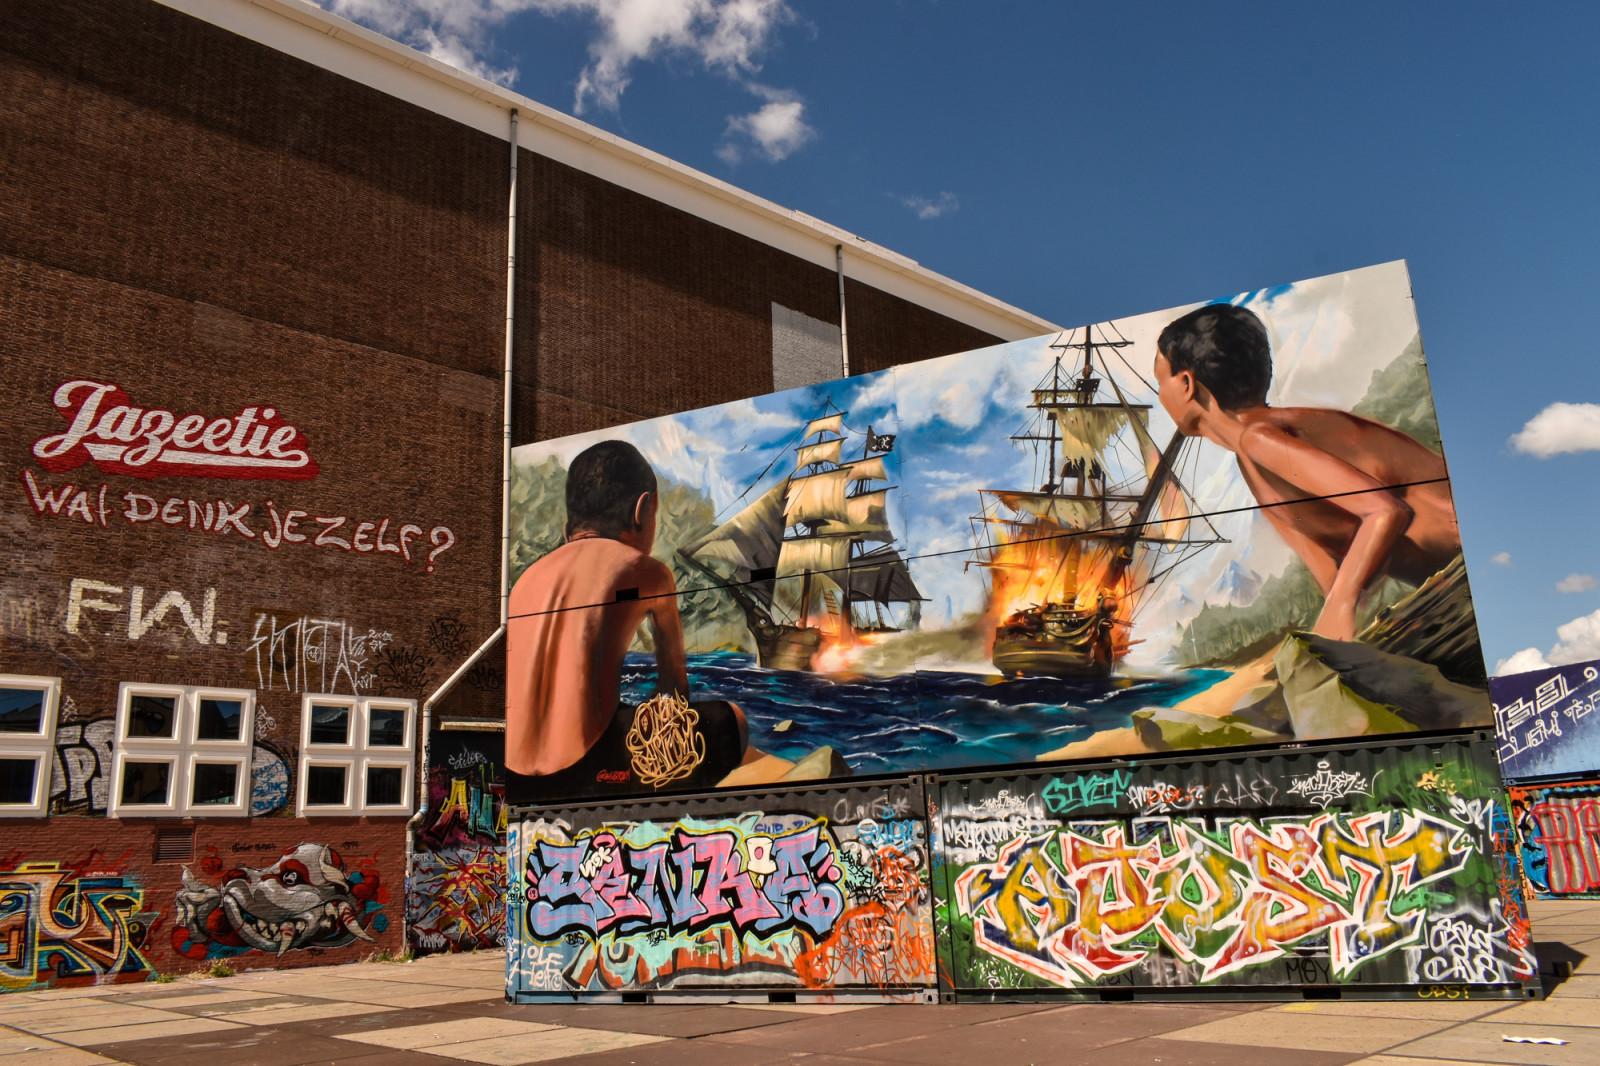 Battleship street art Amsterdam